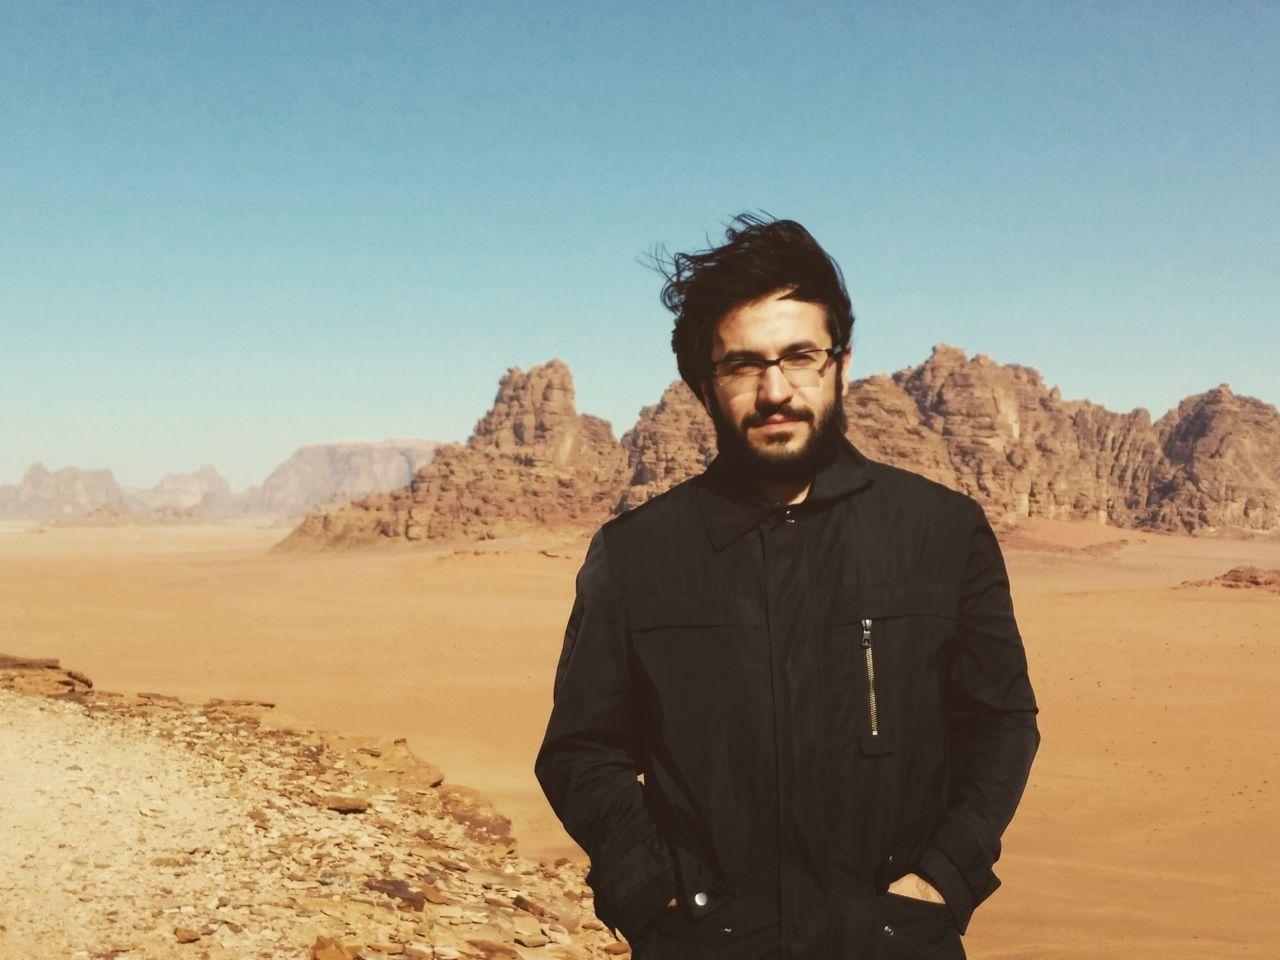 Portrait Of Man At Desert Against Clear Blue Sky